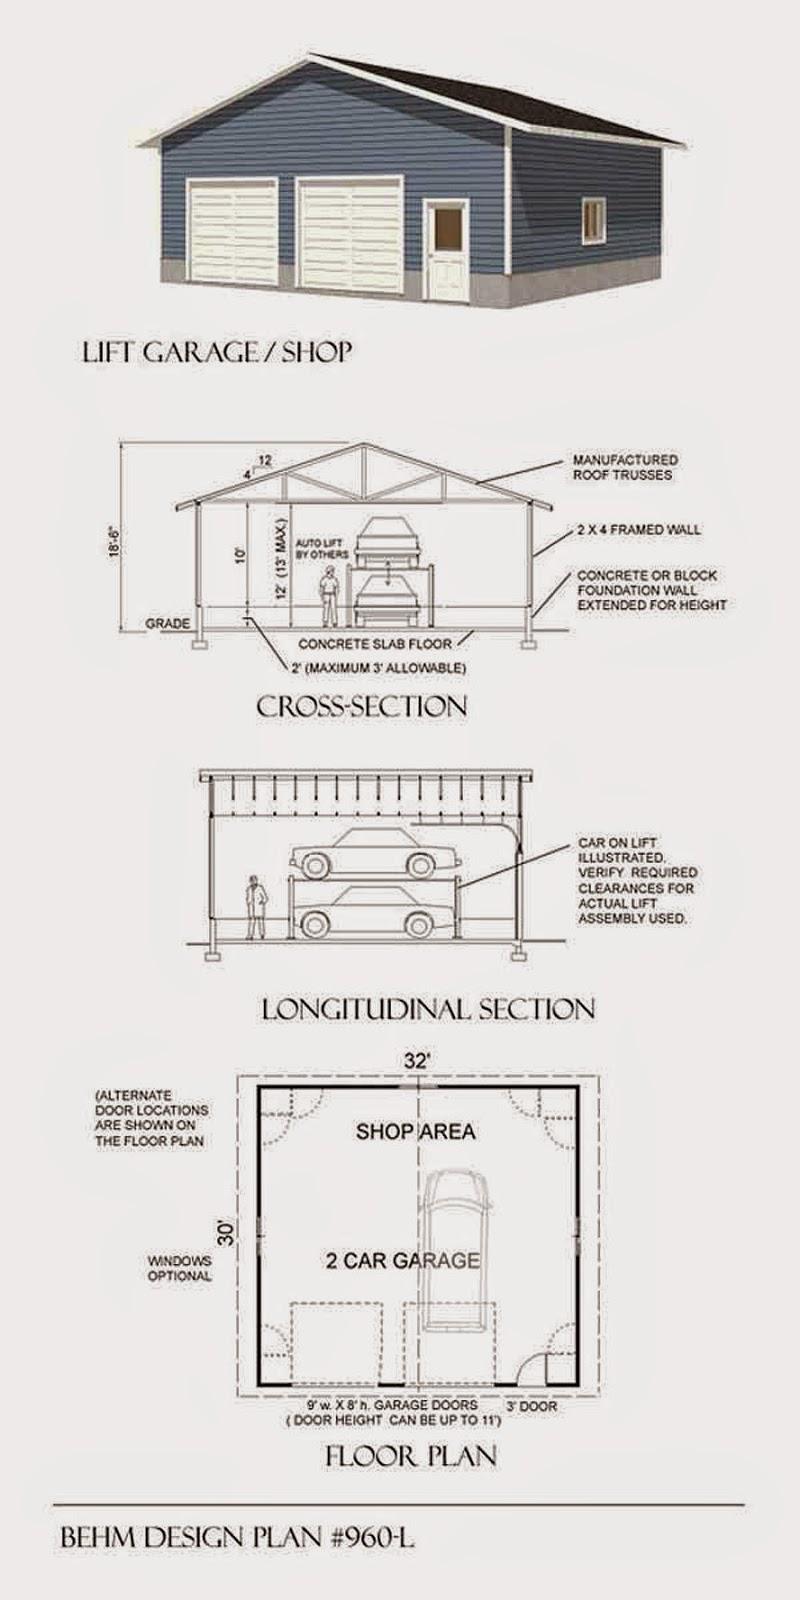 Garage plans blog behm design garage plan examples for Car lift plans